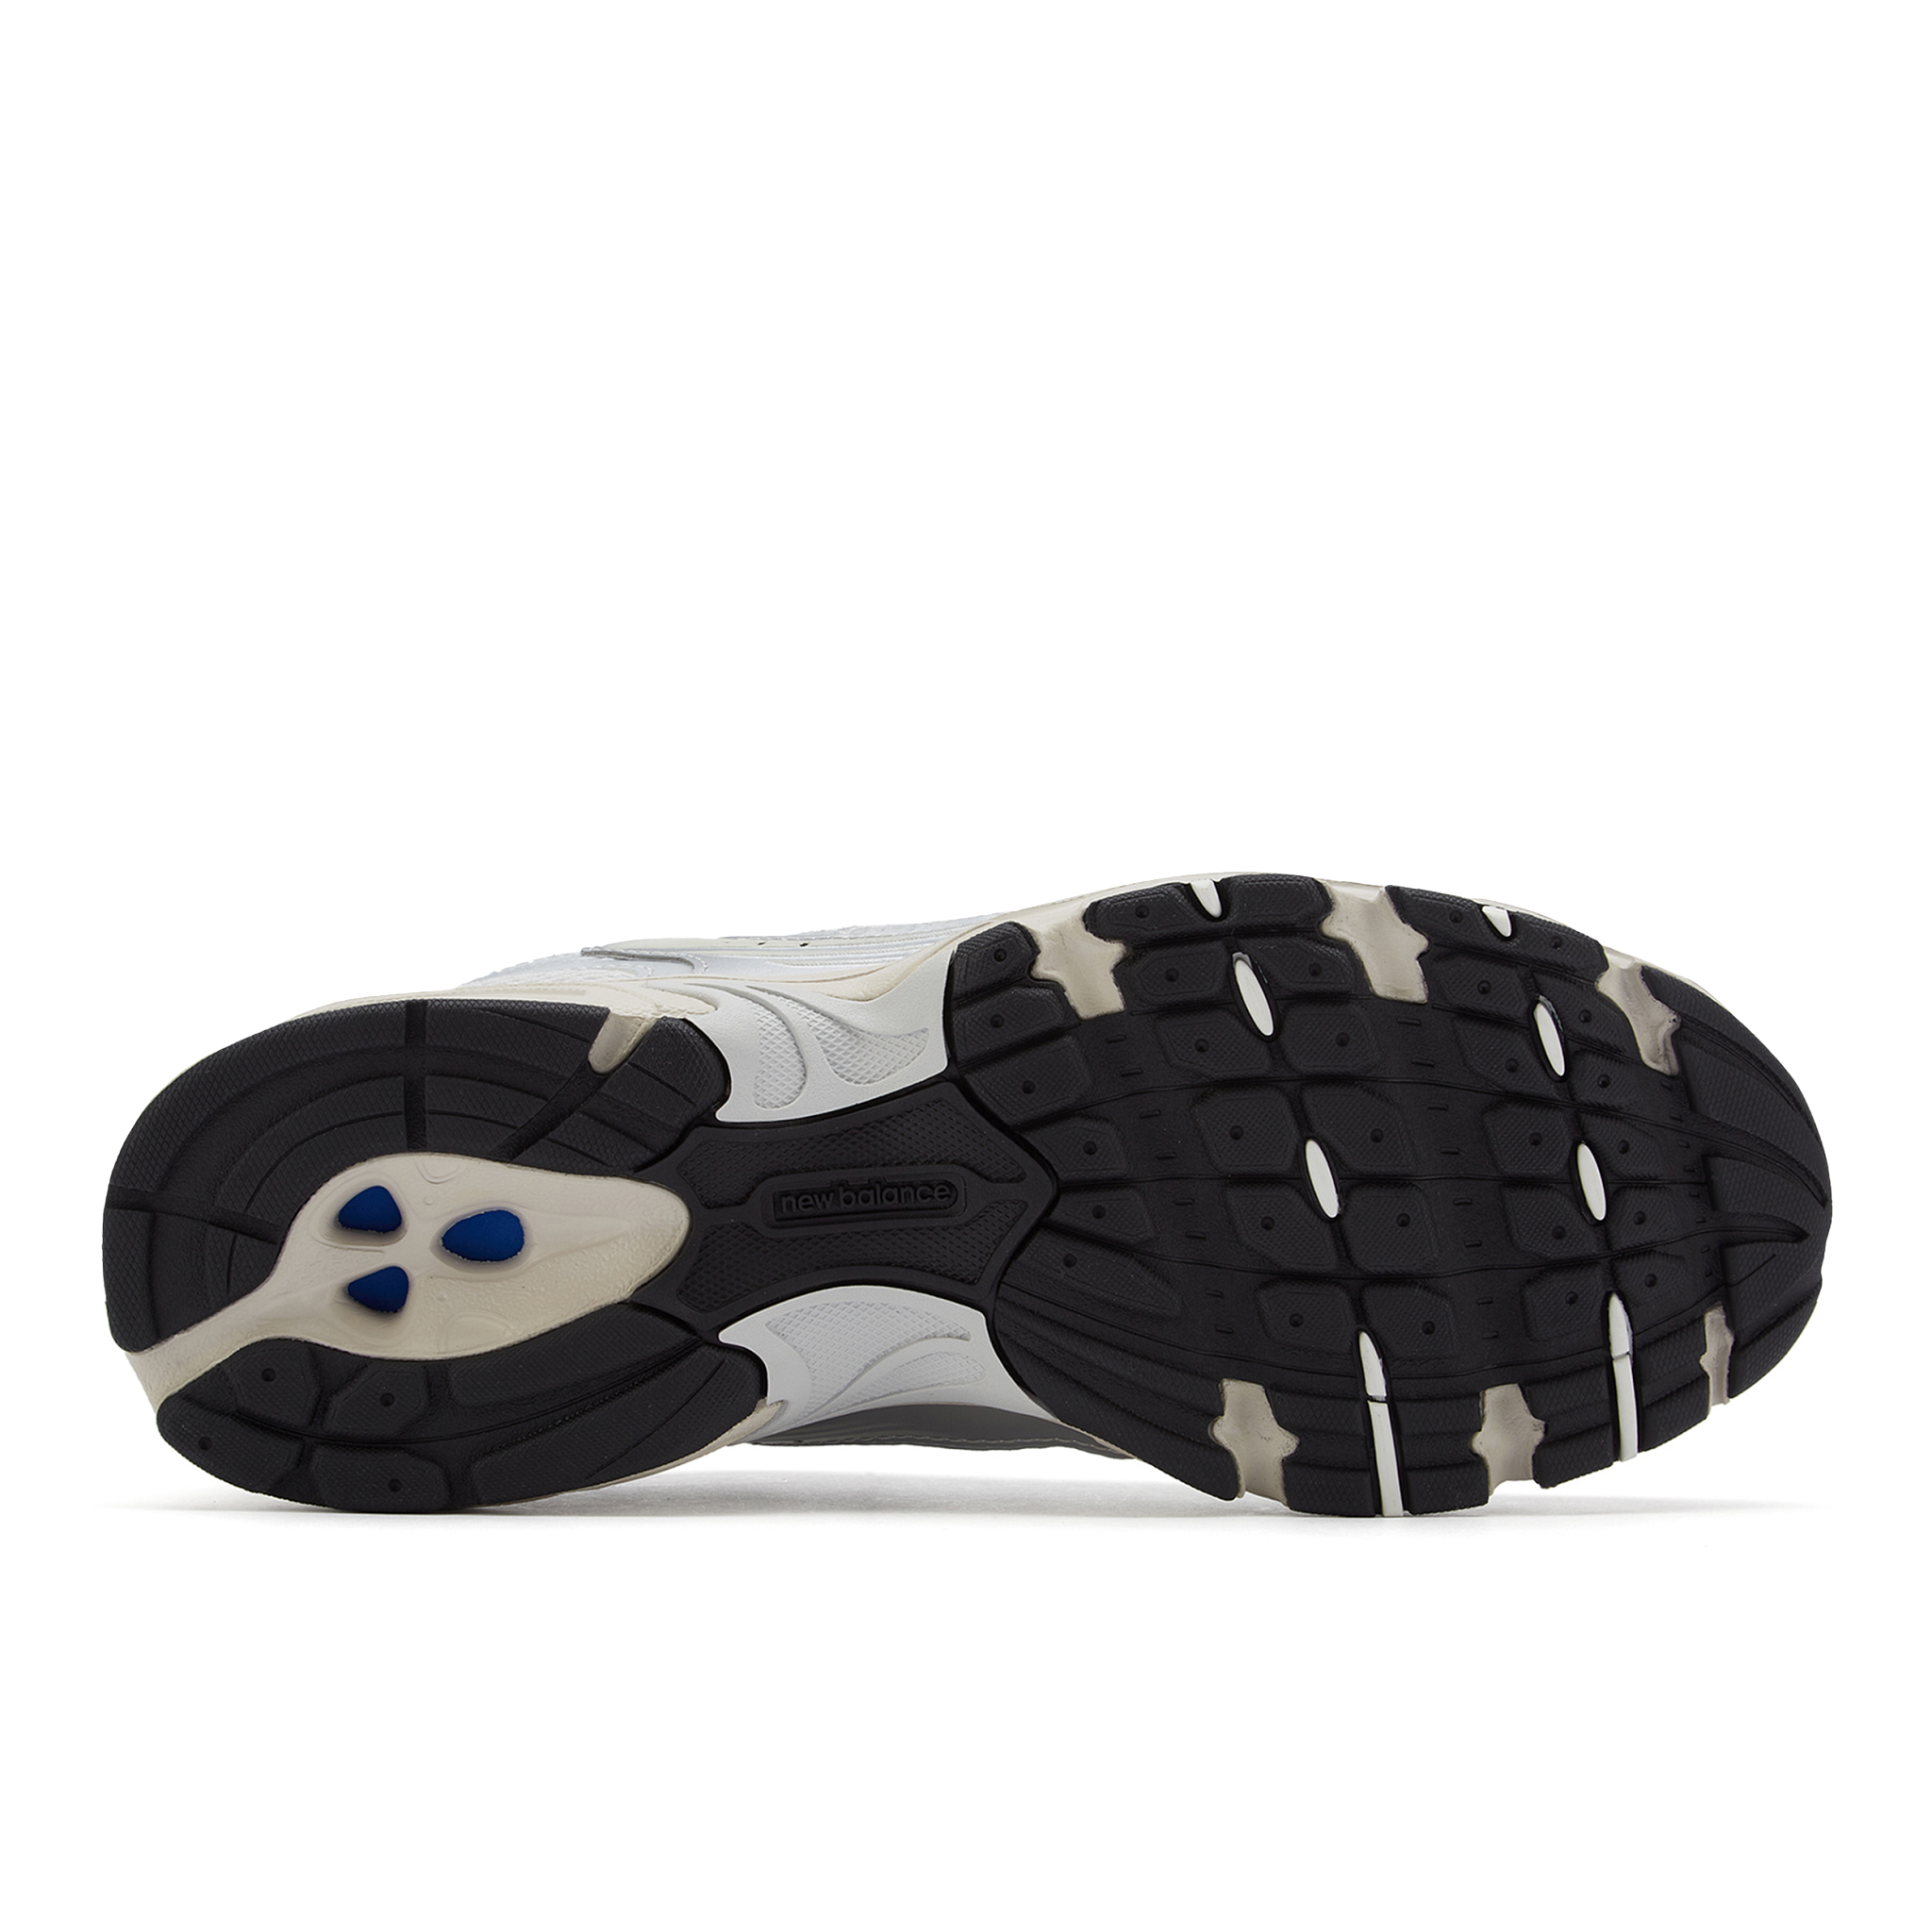 New Balance 530KA sneakers, Summer Fog, 37